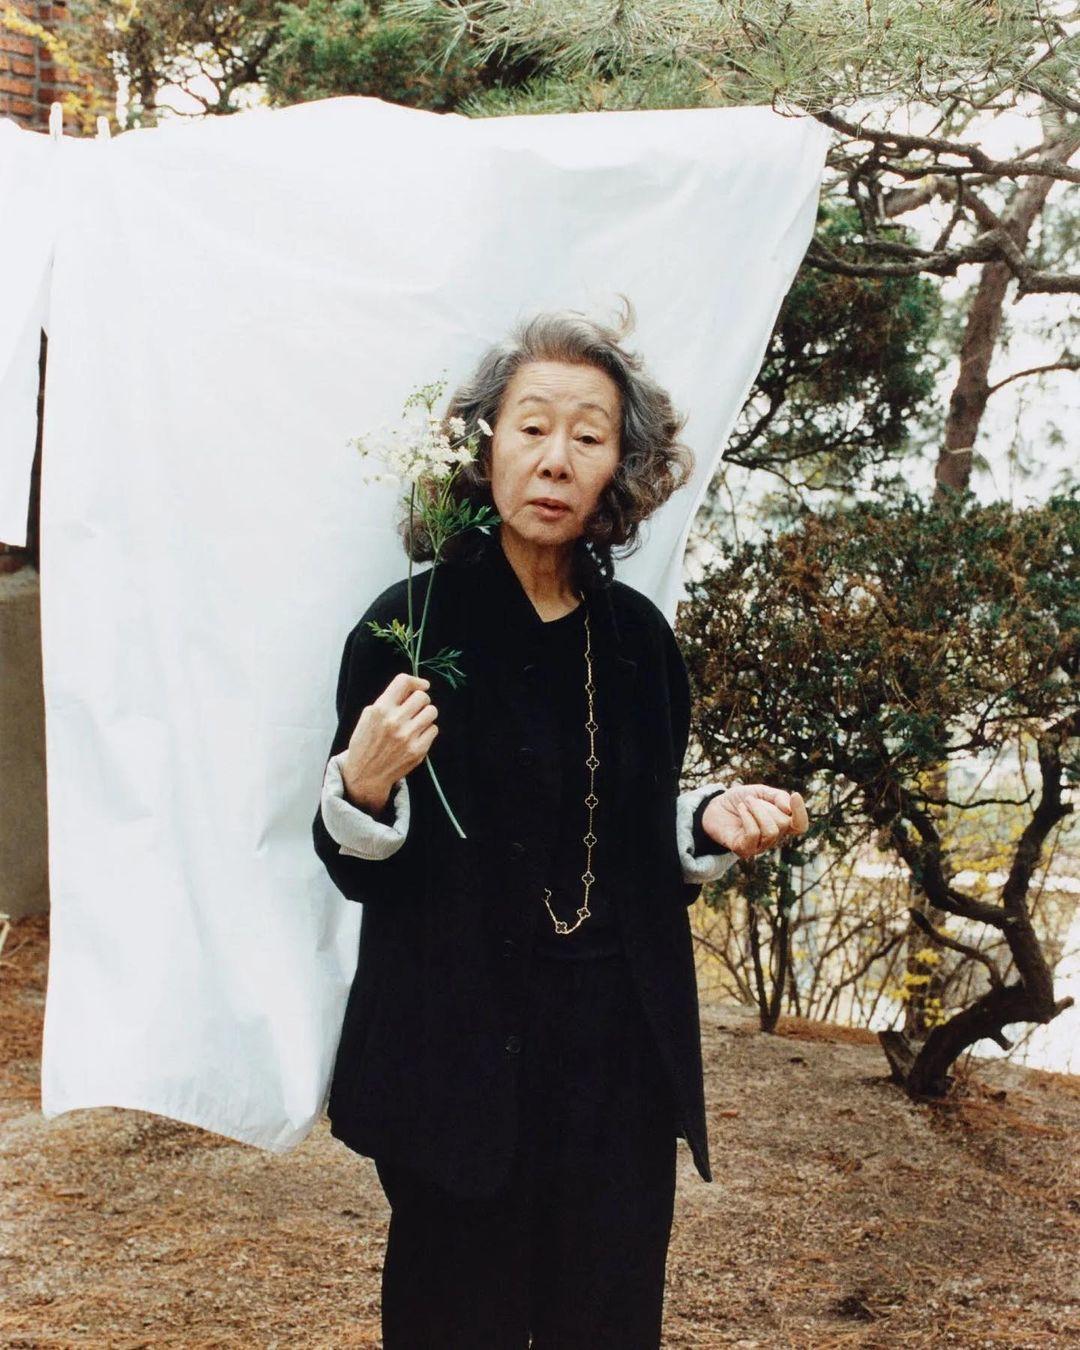 Bintangi Film Minari, Ini Gaya Modis Yuh Jung Youn  di Usia 73 Tahun